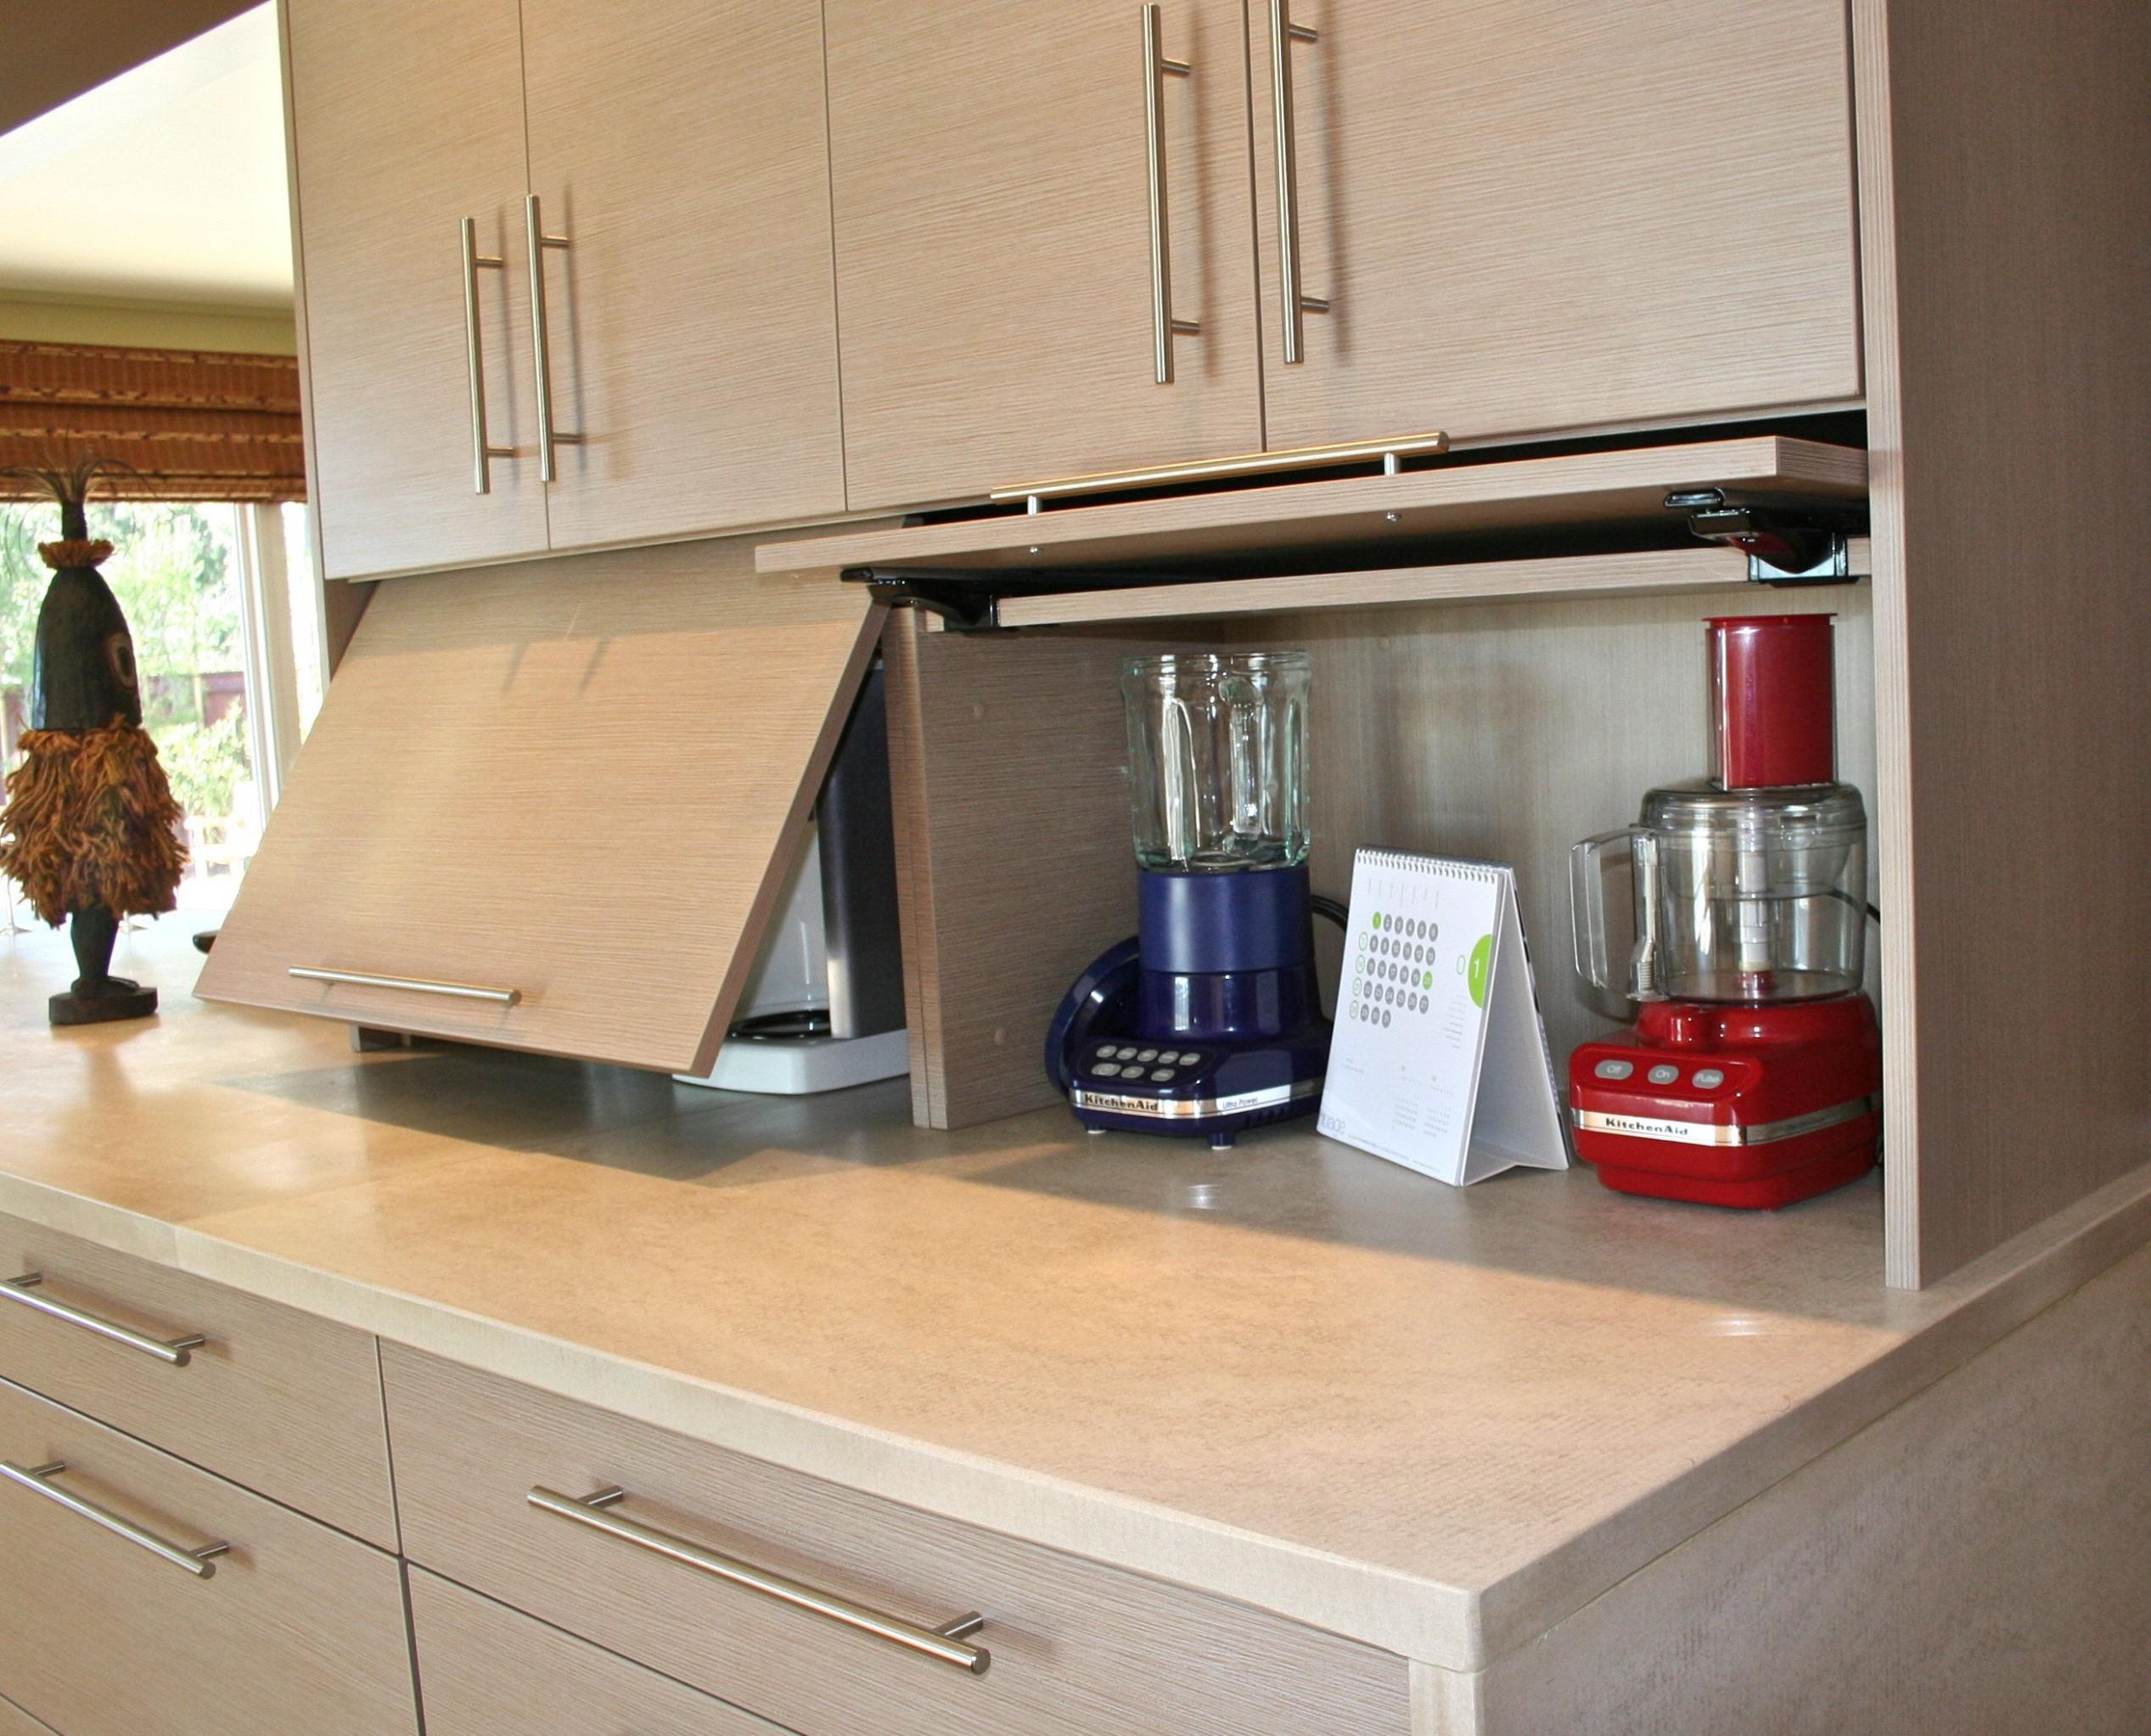 alucina design studio  appliance garage  Small kitchen appliance  - Corner Kitchen Cabinet Appliance Garage